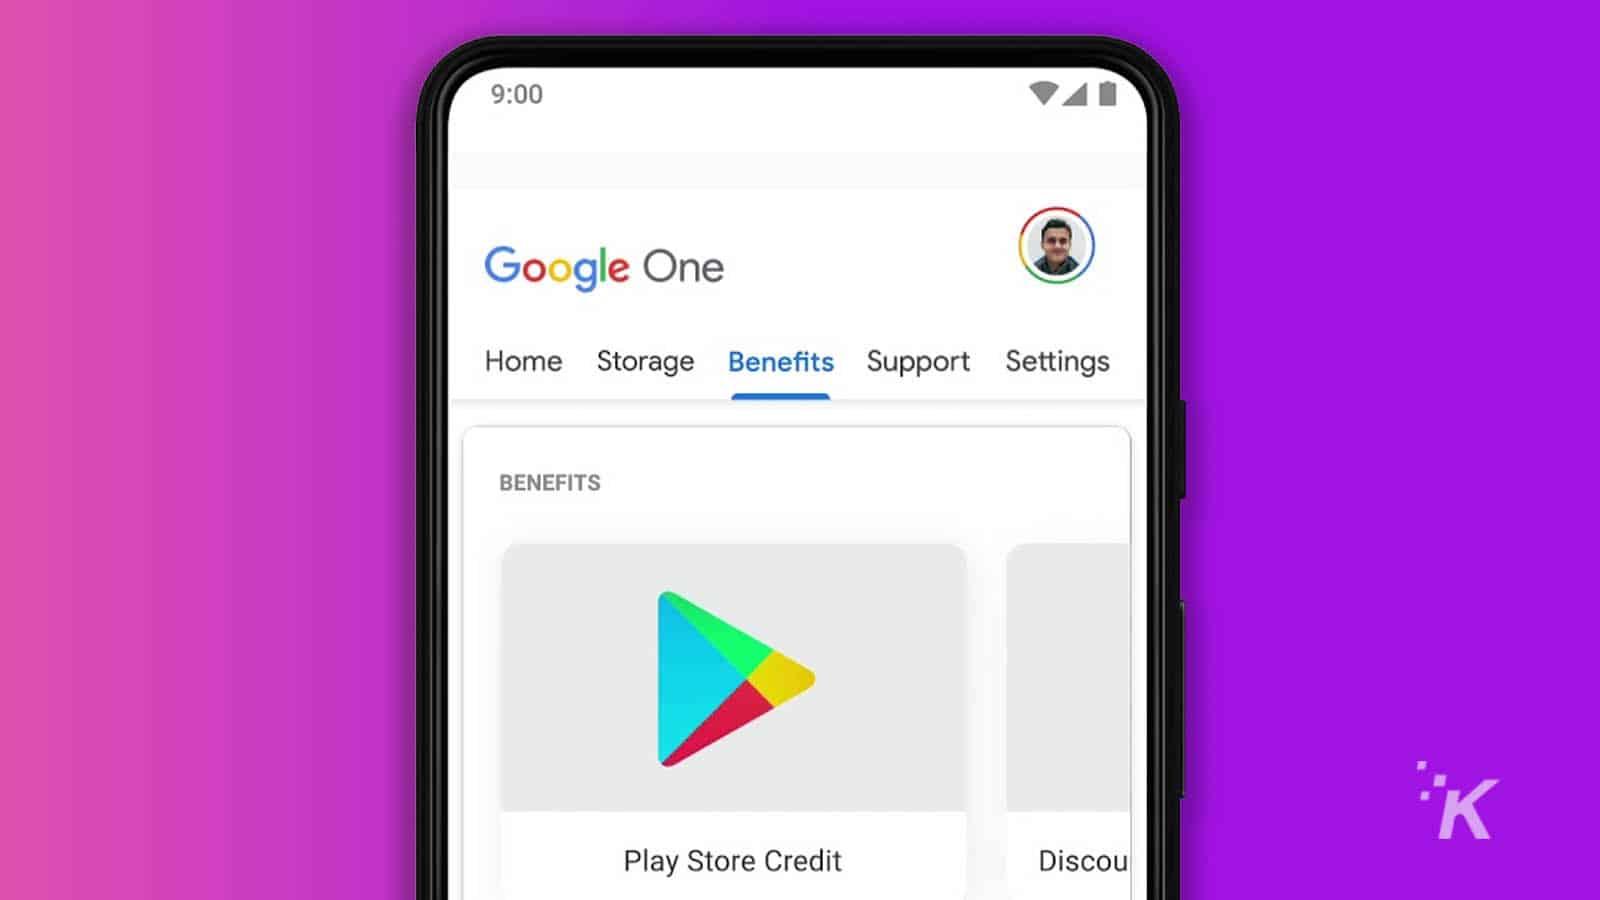 google one on smartphone